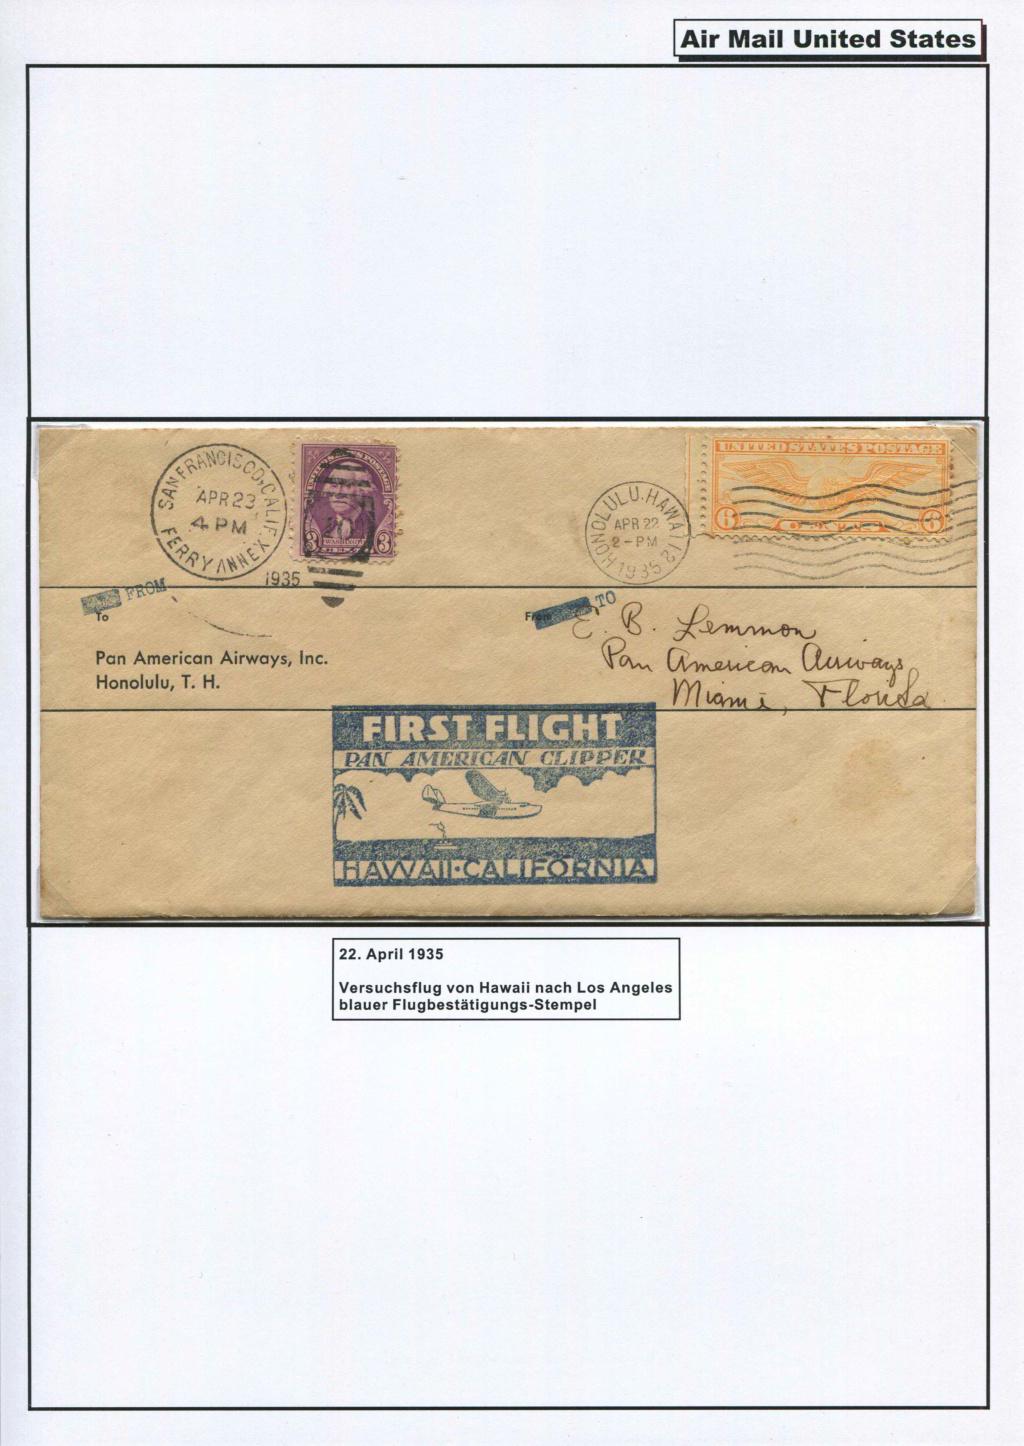 Sammlung FAM 14 (FOREIGN AIR MAIL ROUTE No 14) - Teil 1 Fam_1422